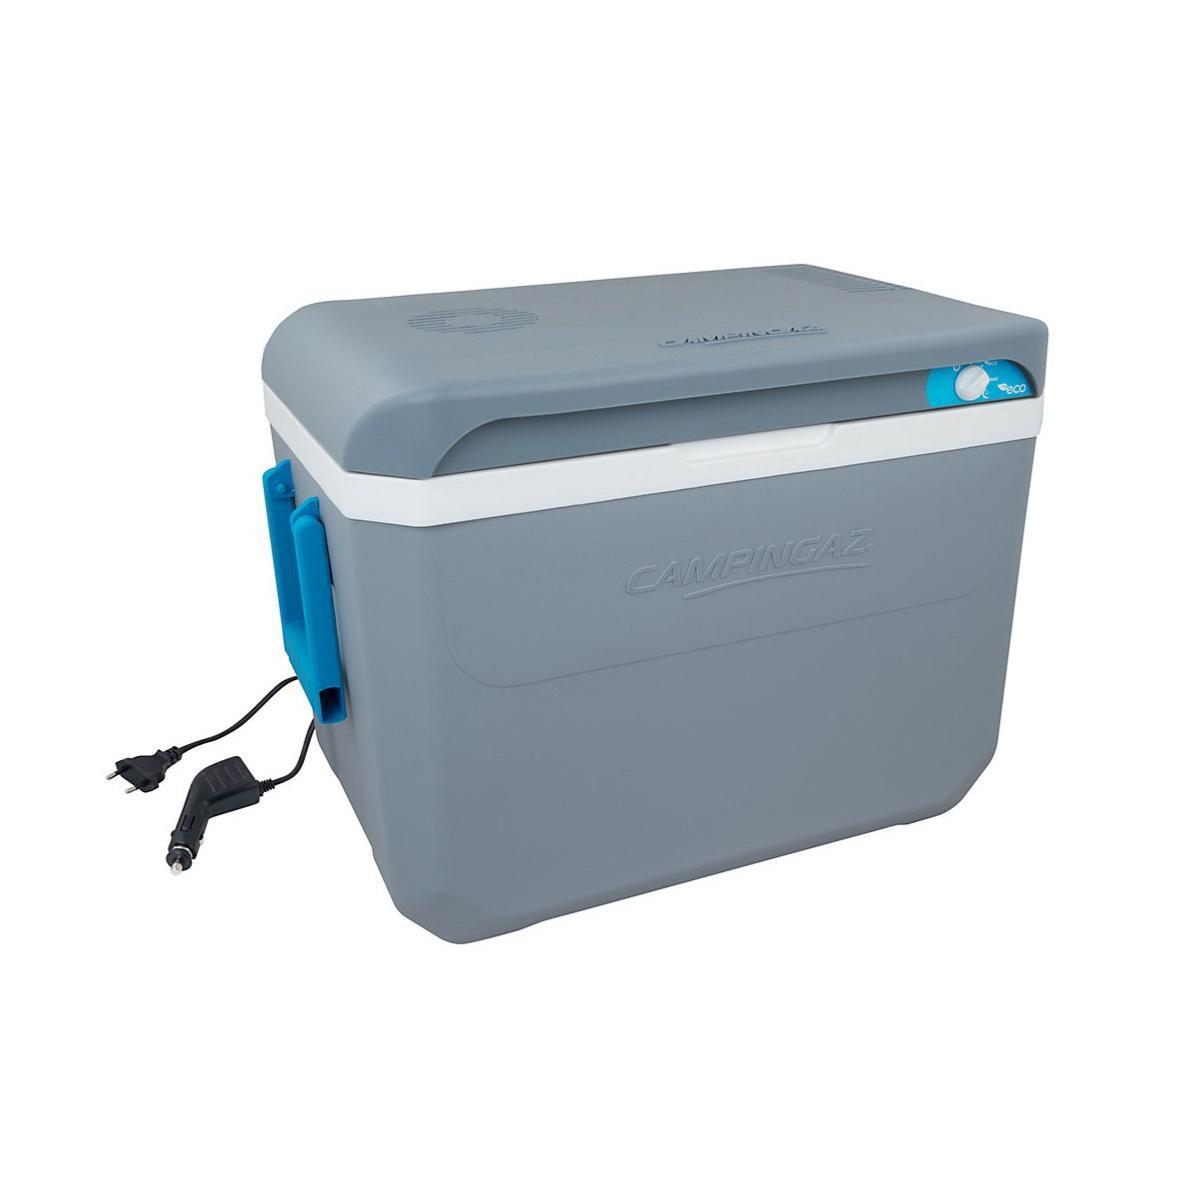 Powerbox Plus 36L Campingaz